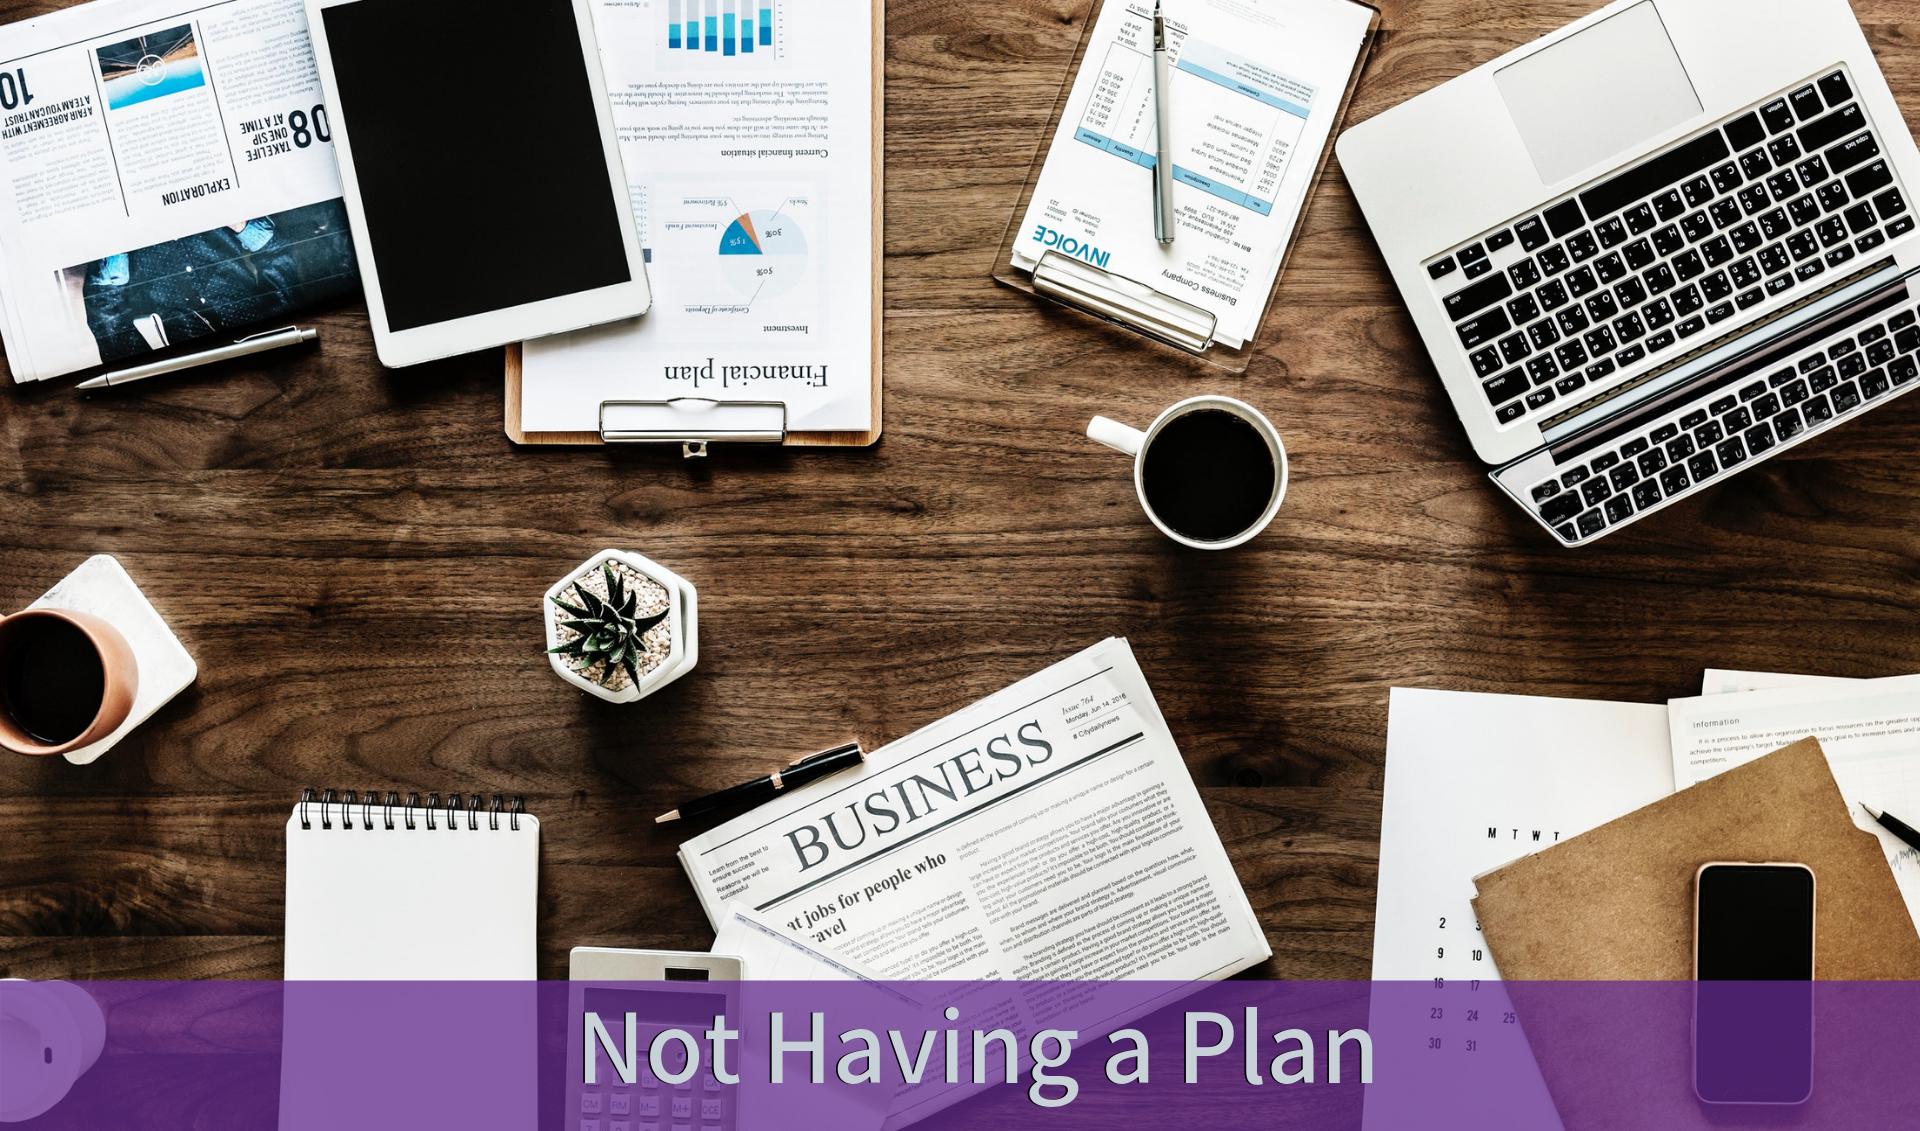 Not Having a Plan